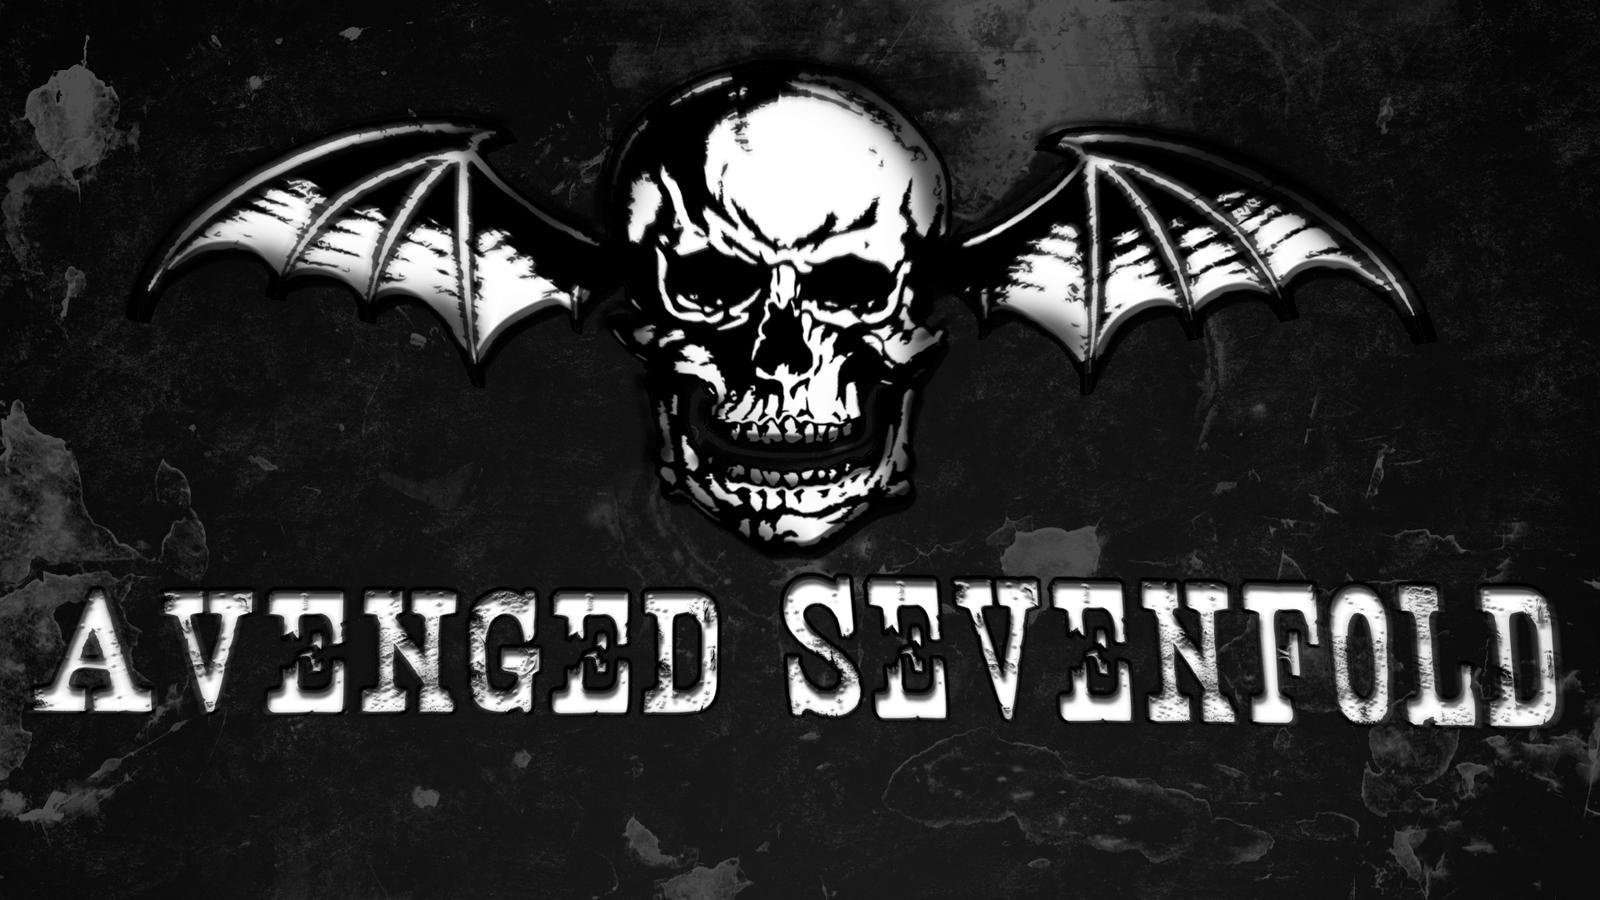 Avenged Sevenfold Deathbat Wallpaper (1920X1080) by ...